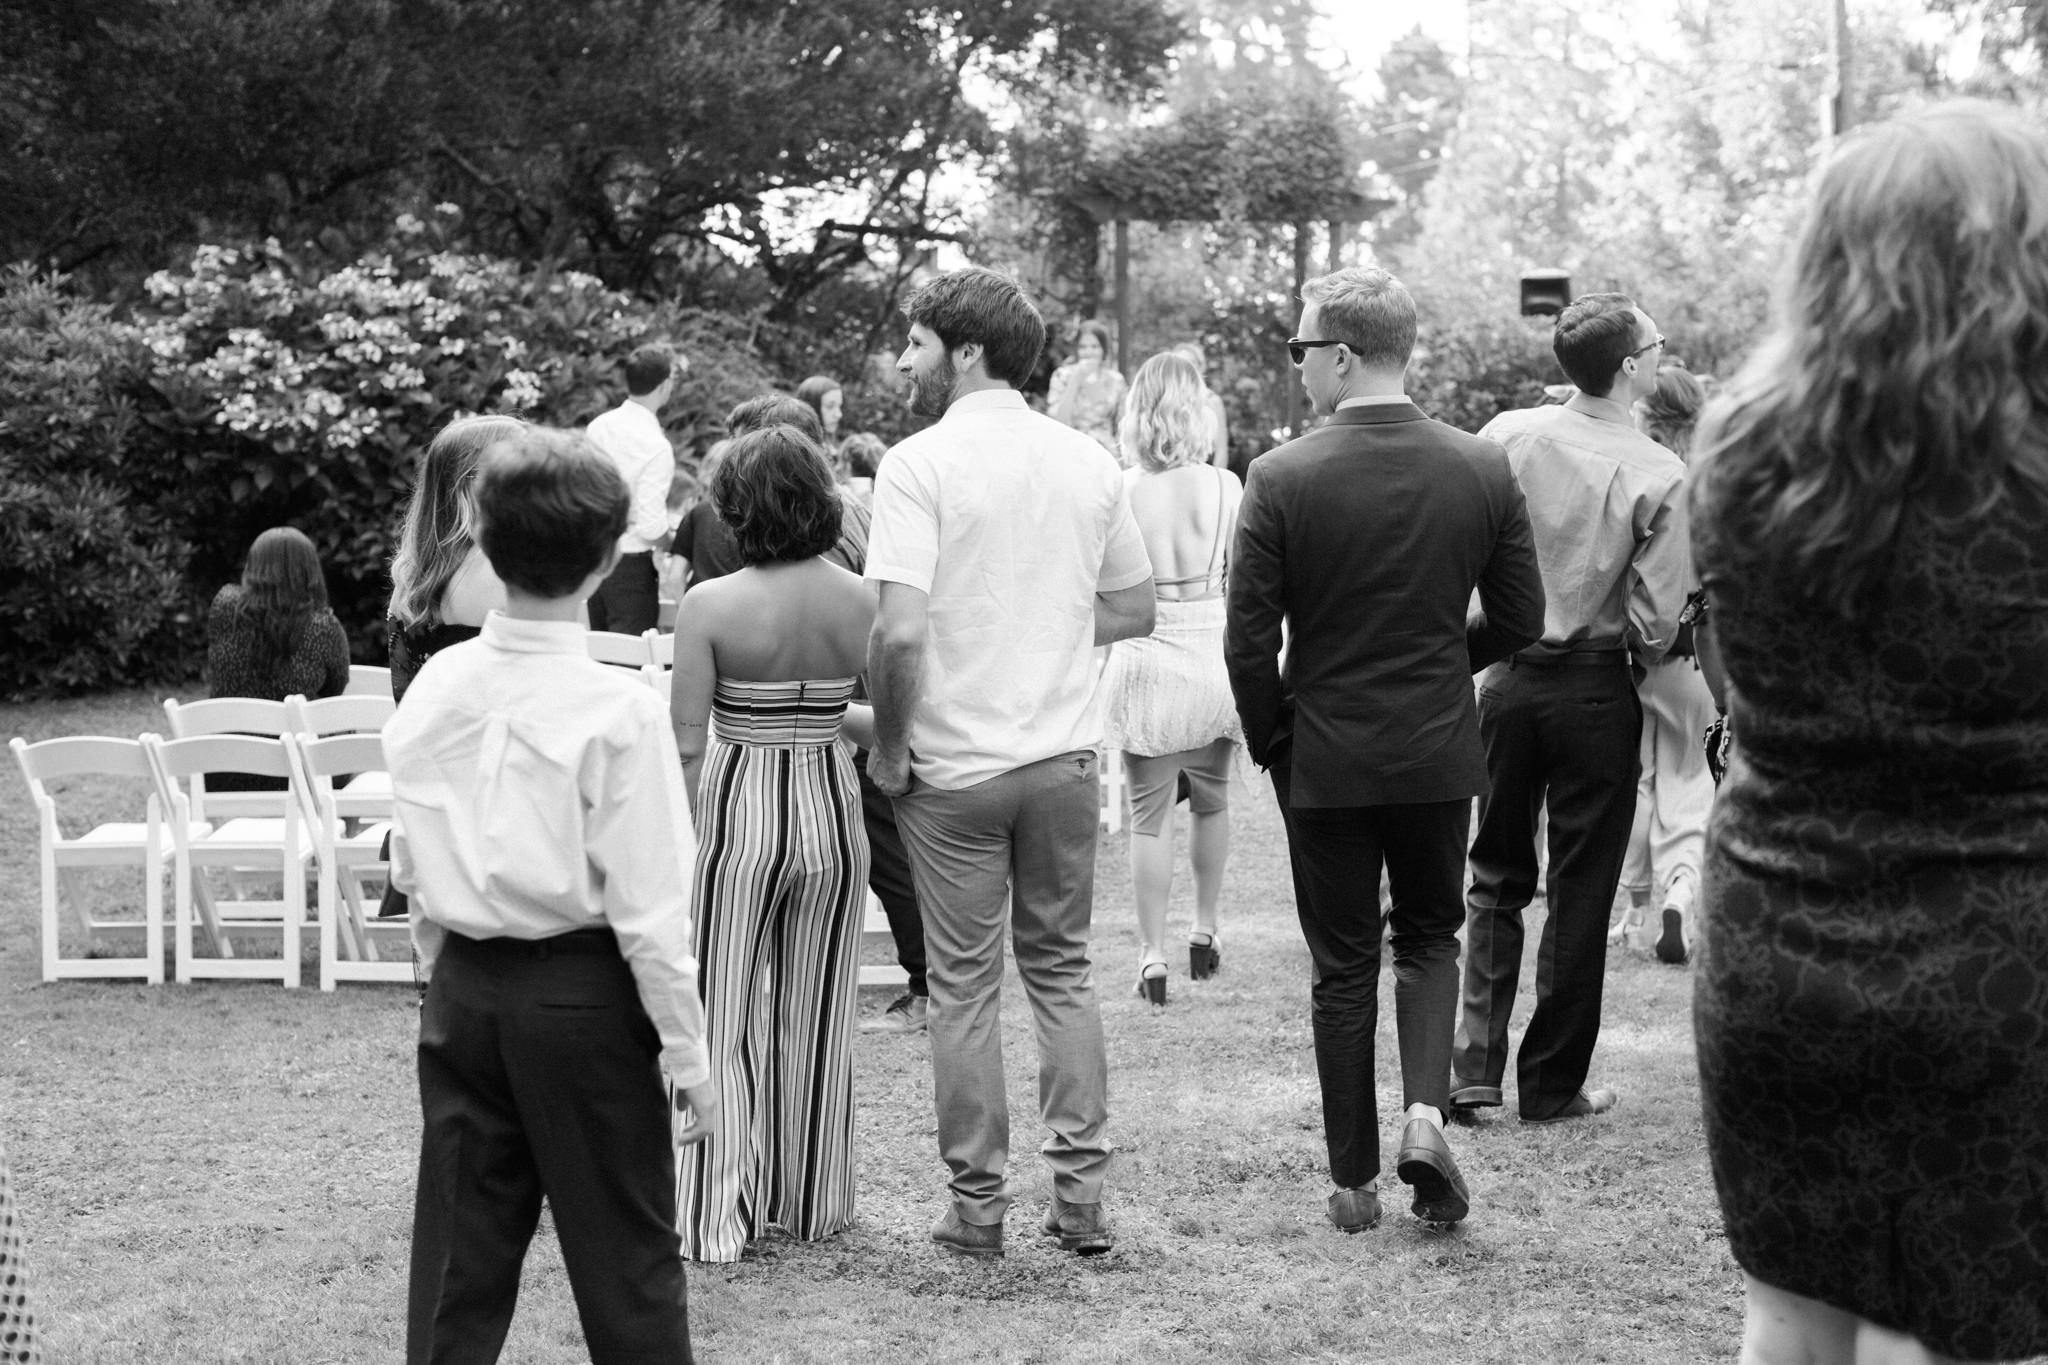 Backyard-Bainbridge-Island-Wedding-Alycia-Lovell-Photography-80.JPG